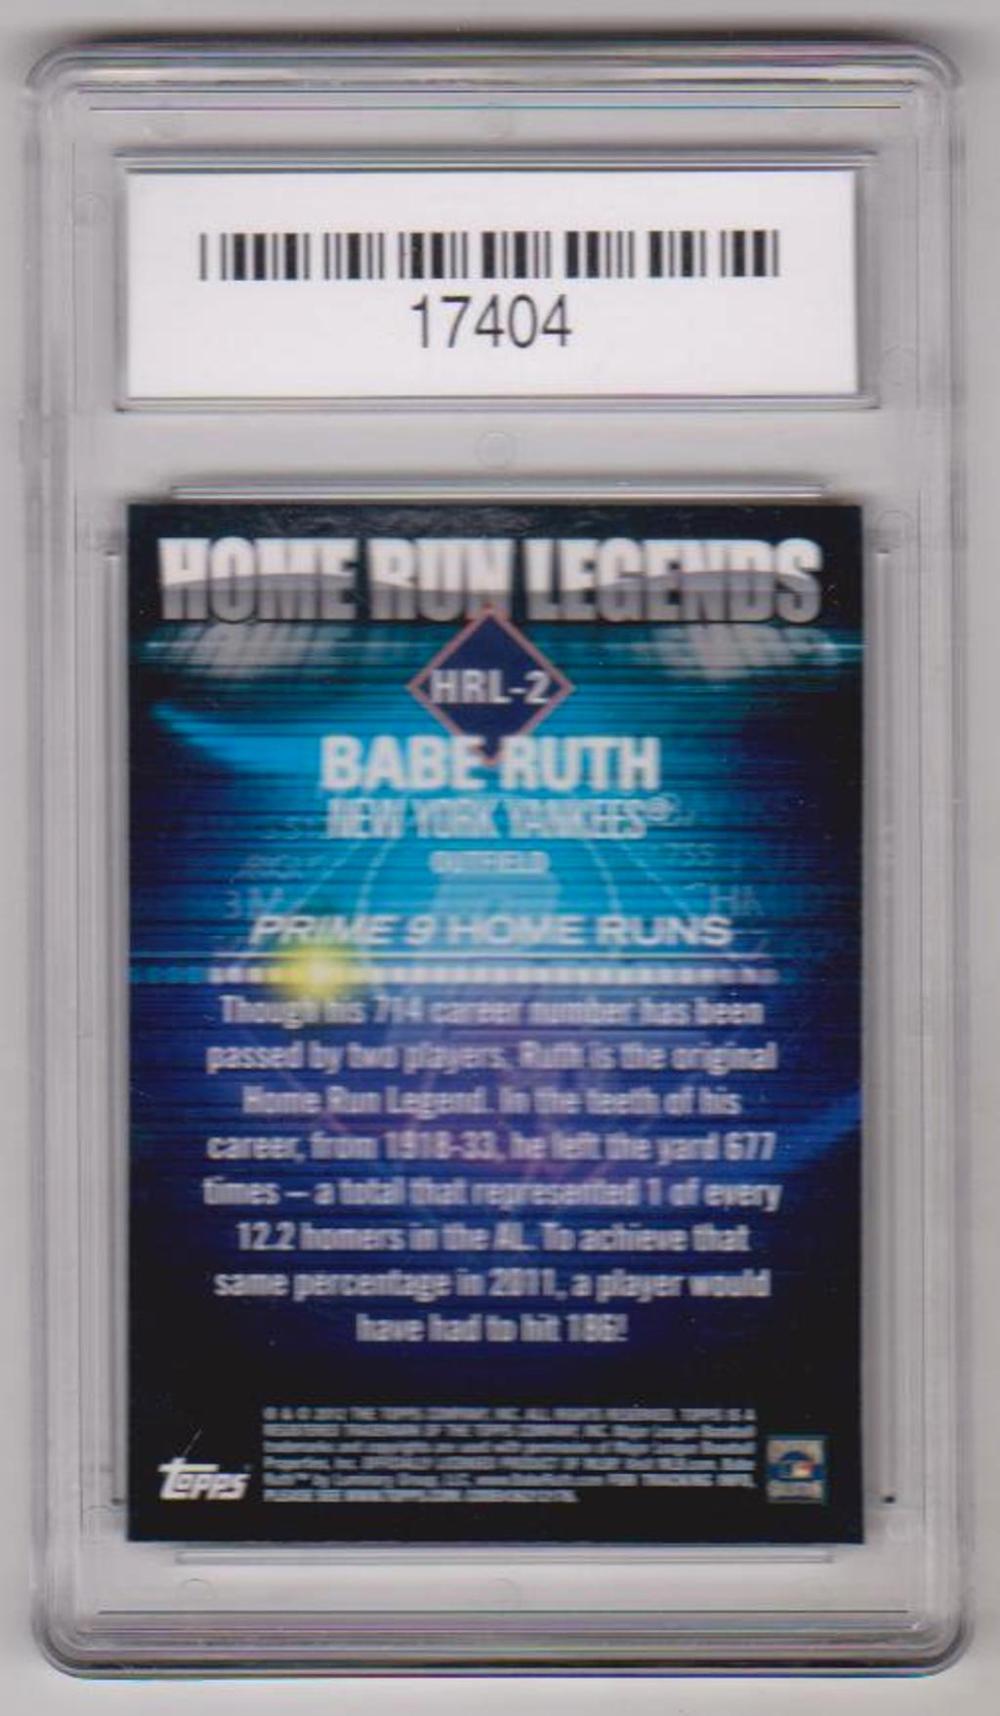 Lot 15: Graded Gem Mint 10 Babe Ruth 2012 Topps Prime 9 Home Run Legends #HRL-2 Card